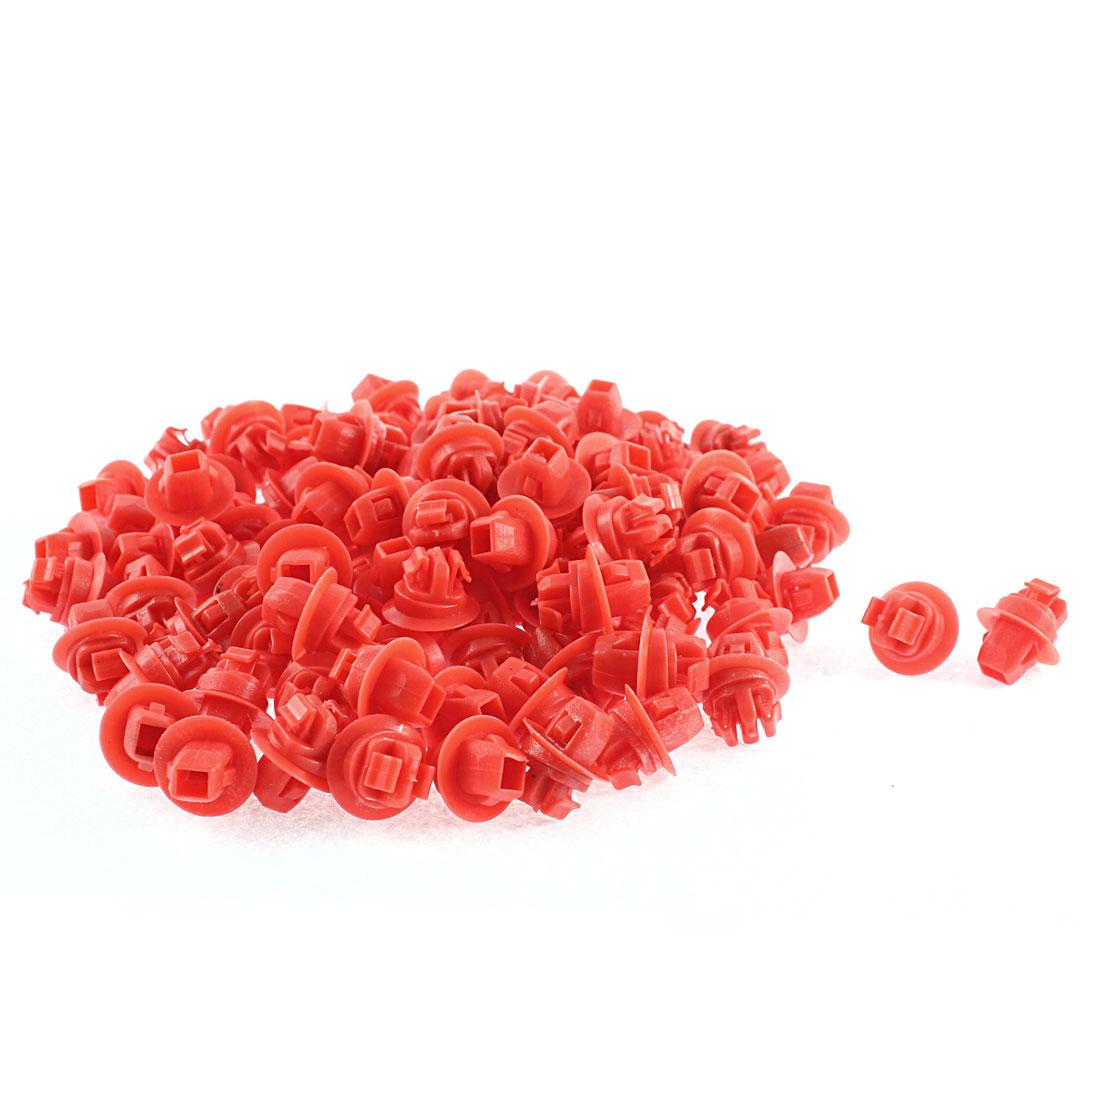 100 Pcs Red Plastic Rivets Bumper Trim Retainer Rivet for Toyota